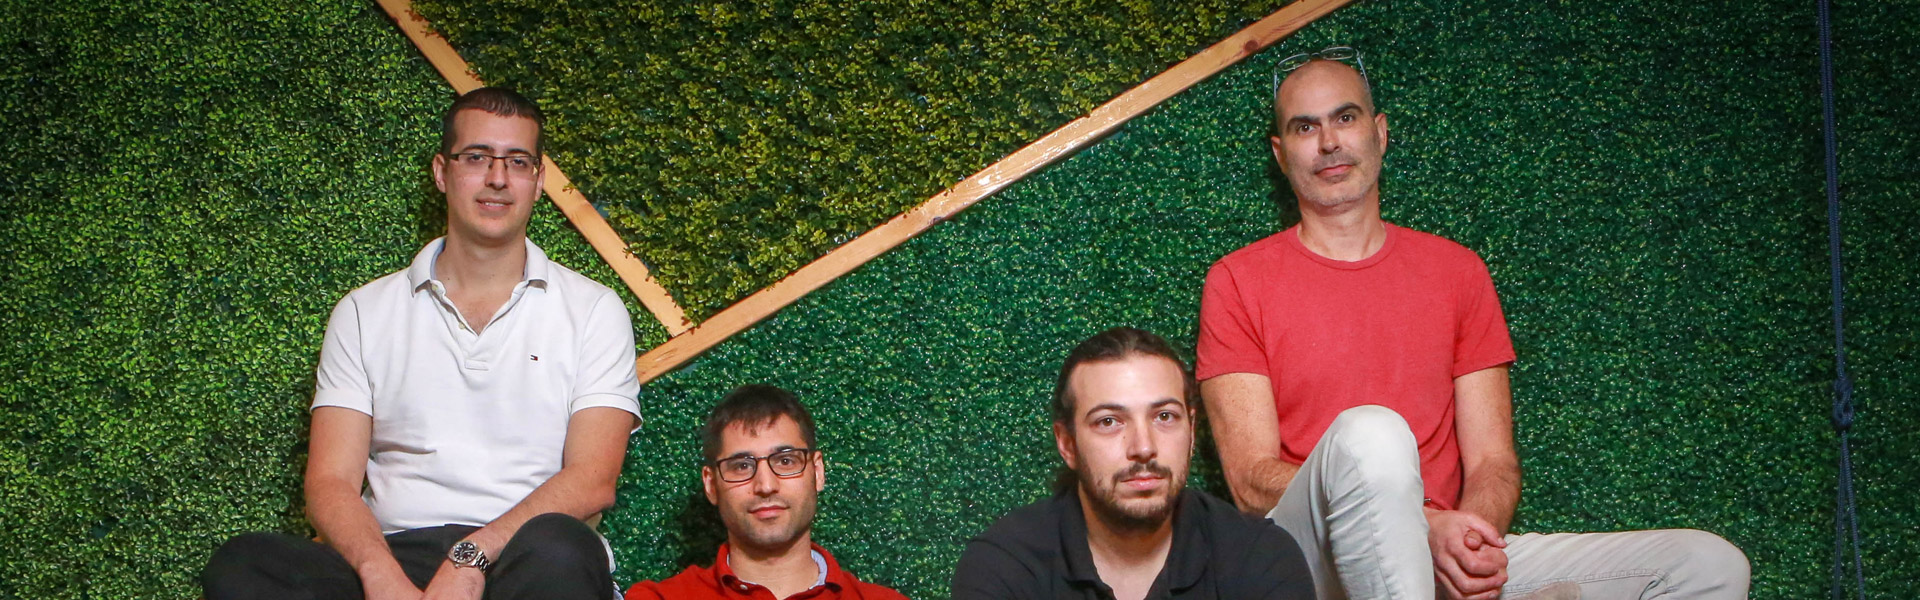 10 Most Promising Start-Ups - Taranis / צילום: שלומי יוסף